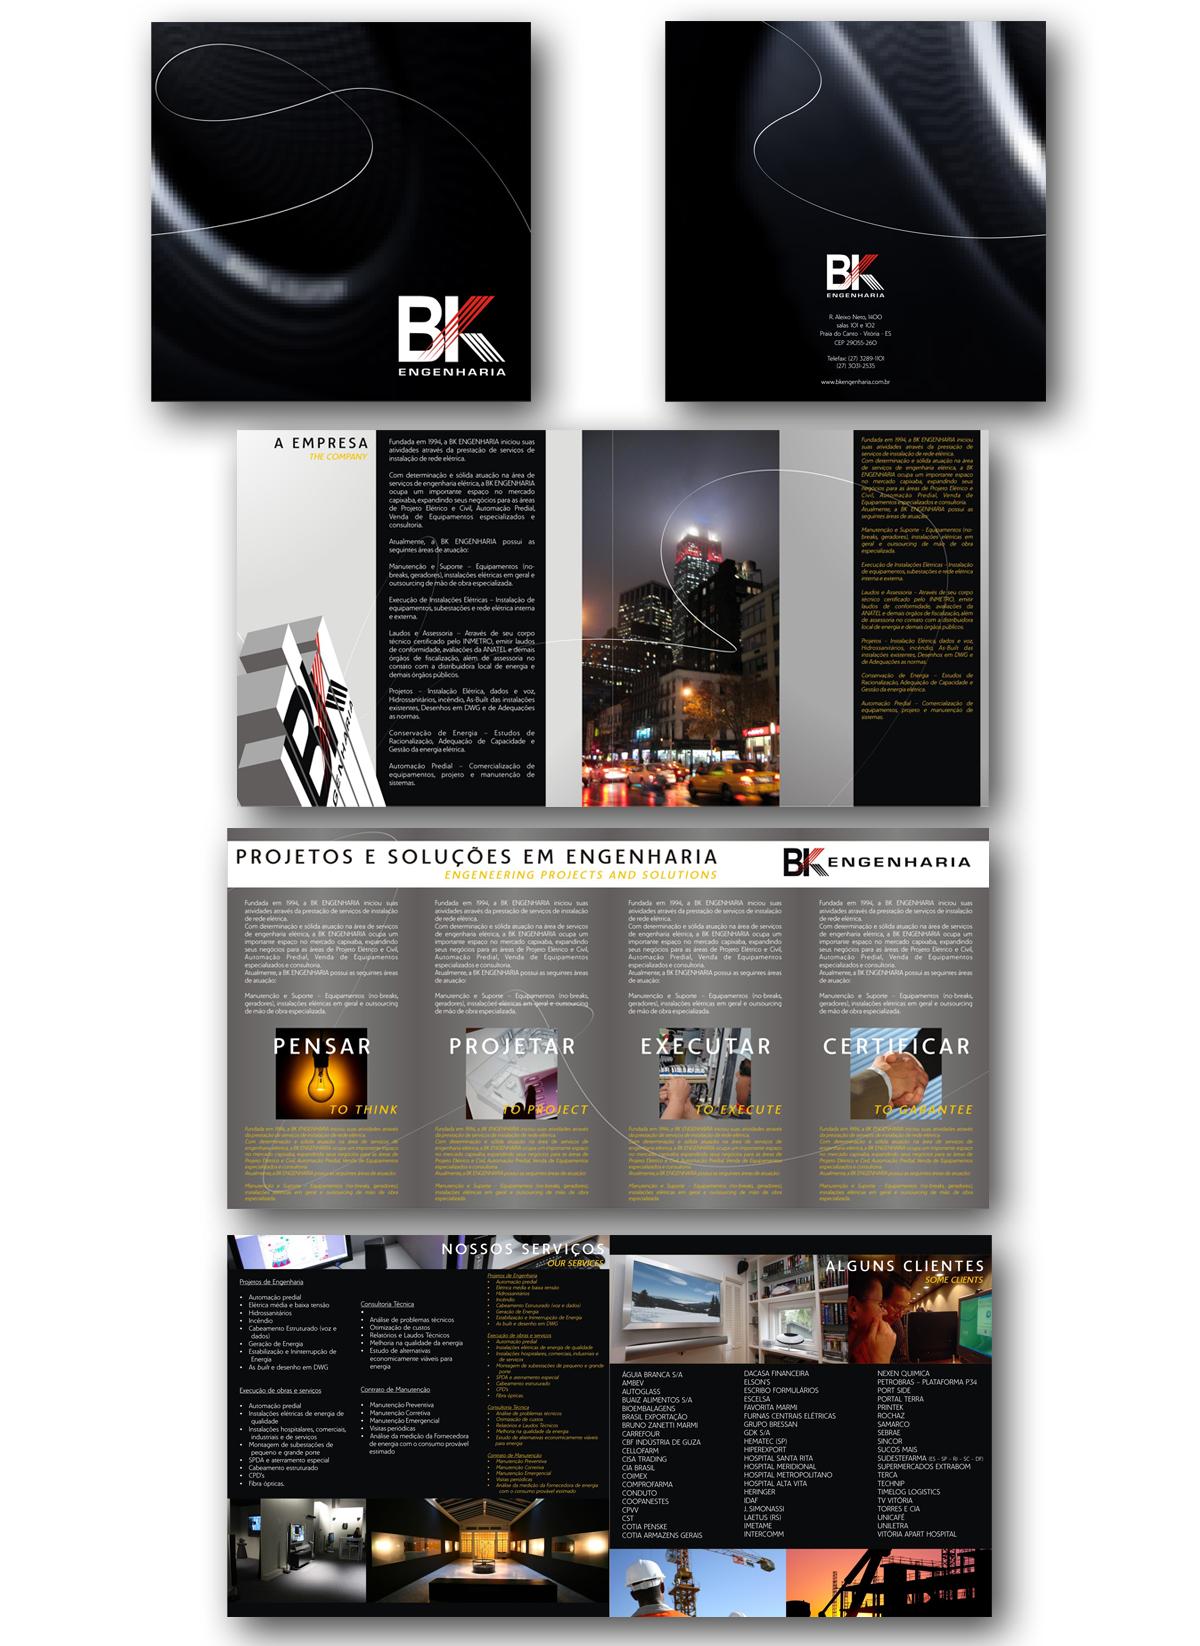 BK Engenharia